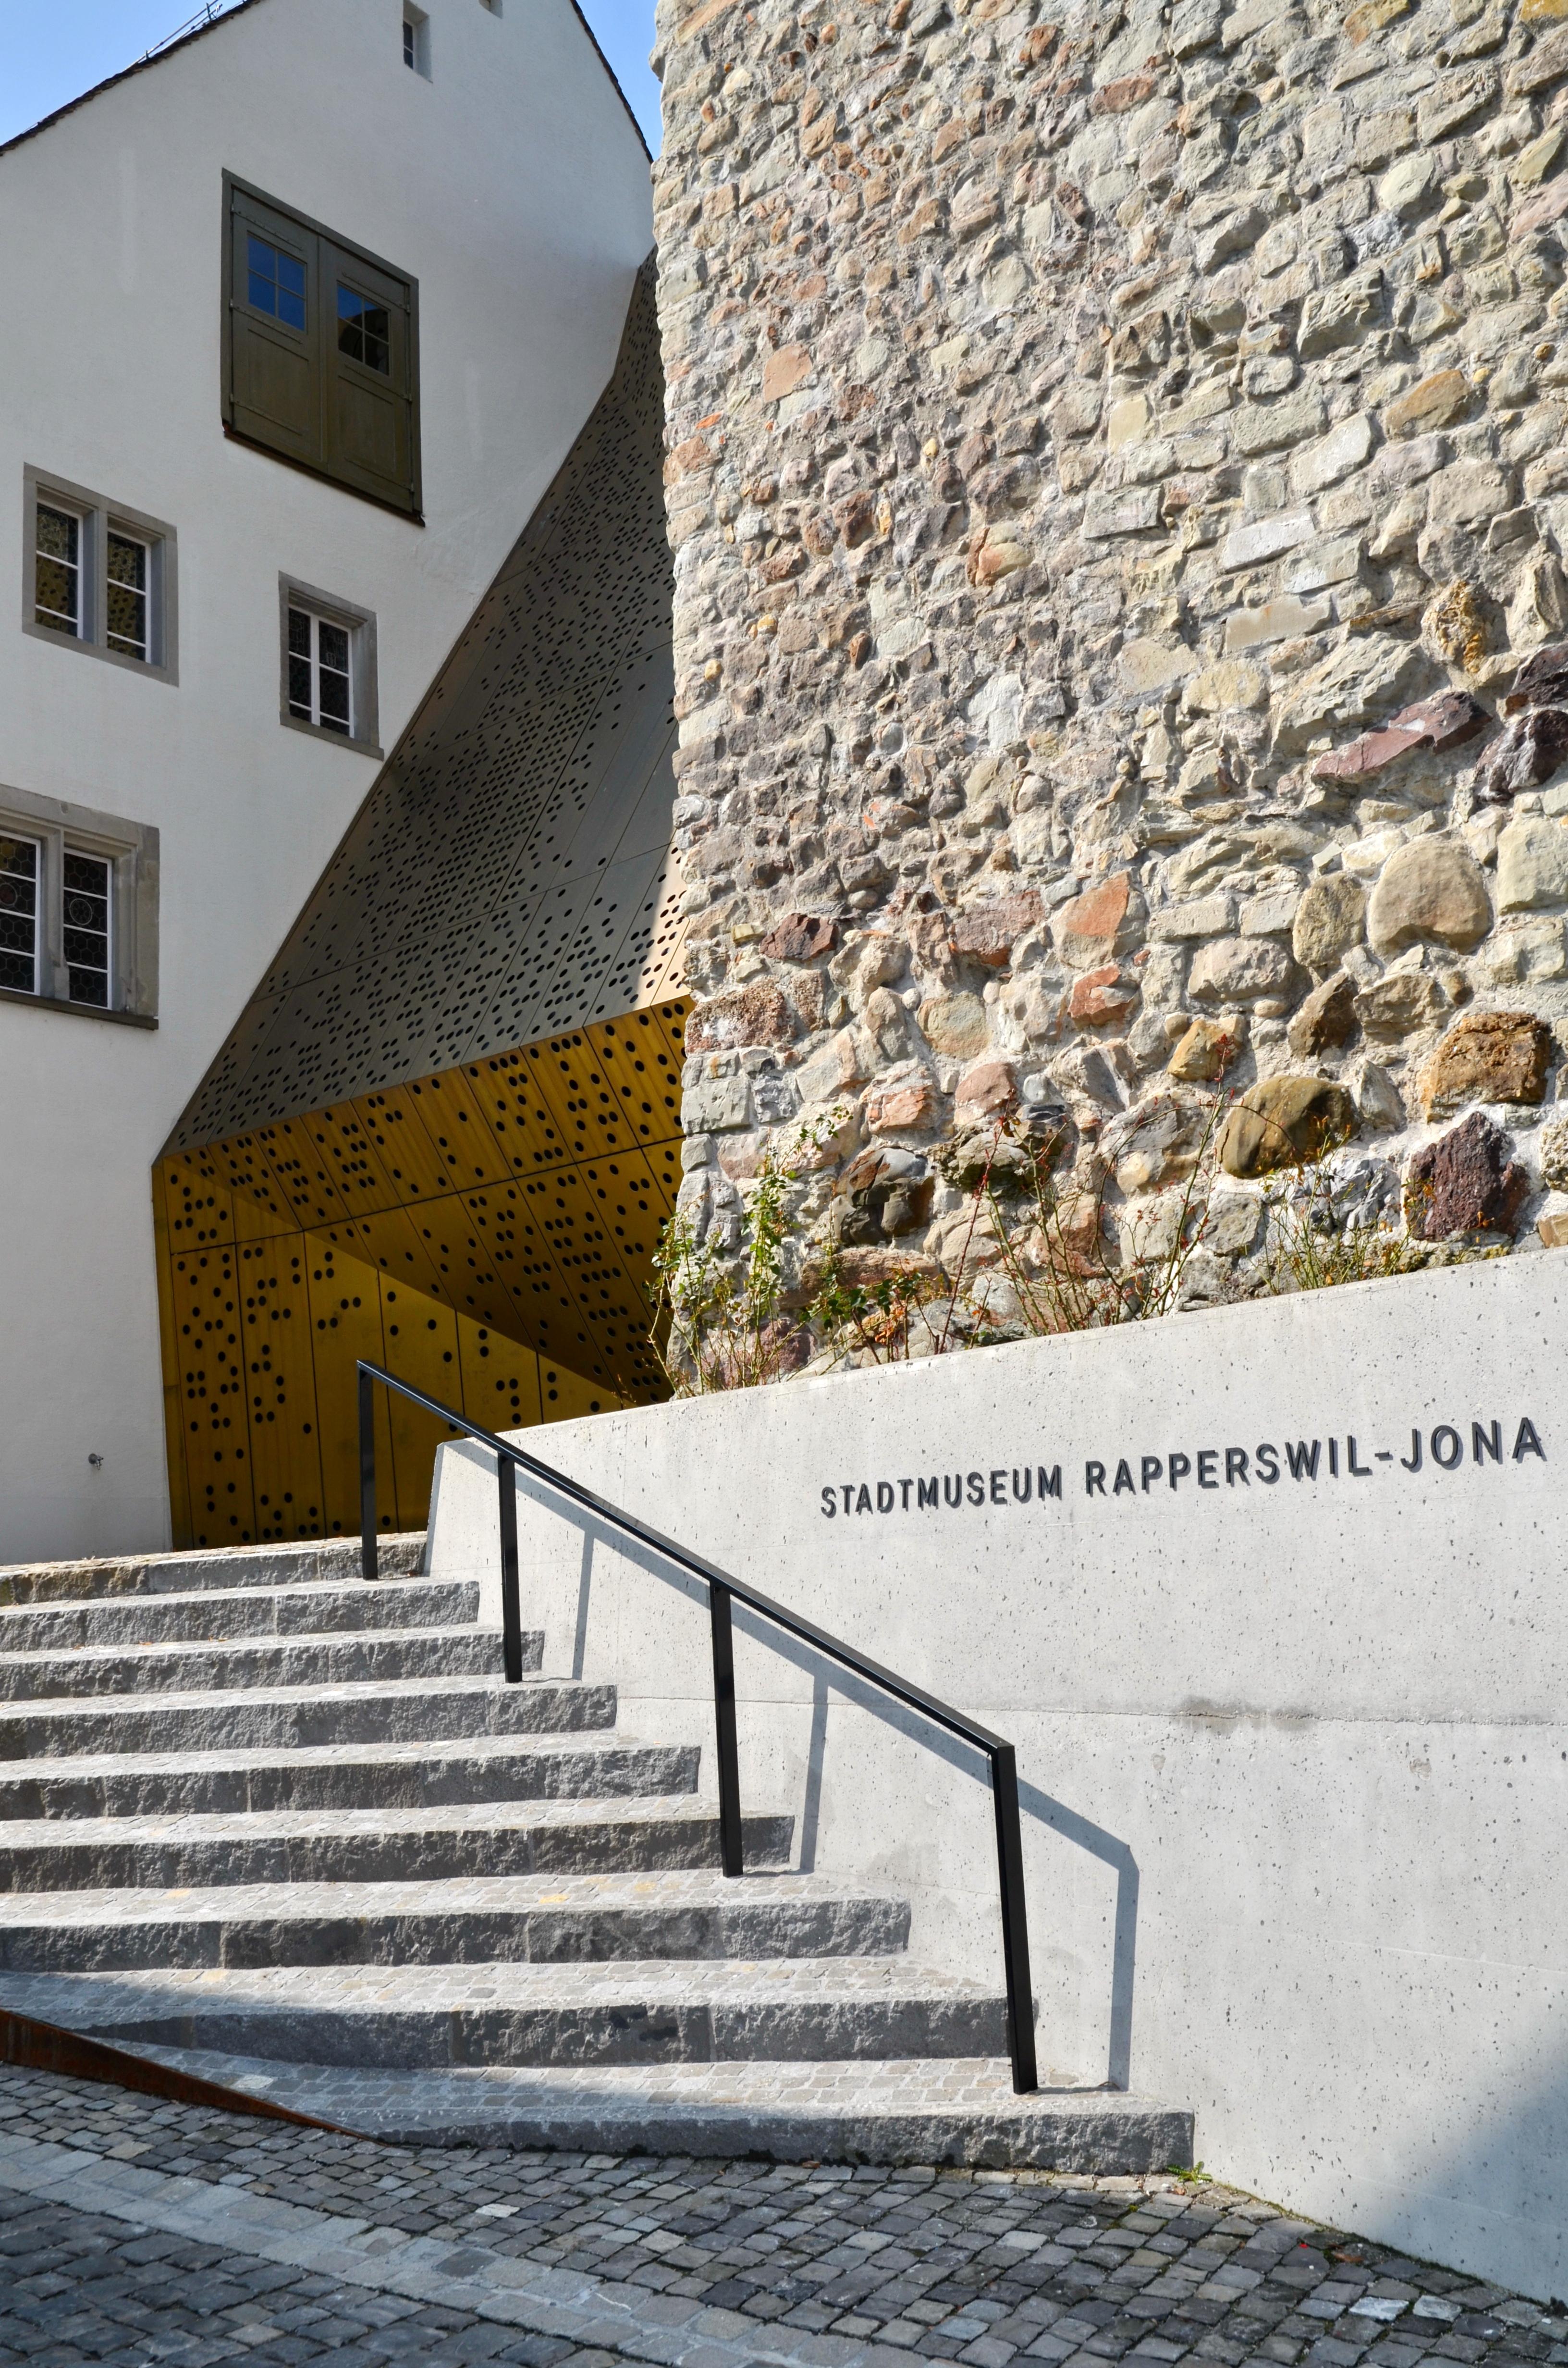 FileStadtmuseum RapperswilJona BrenyHaus und turm Herrenberg